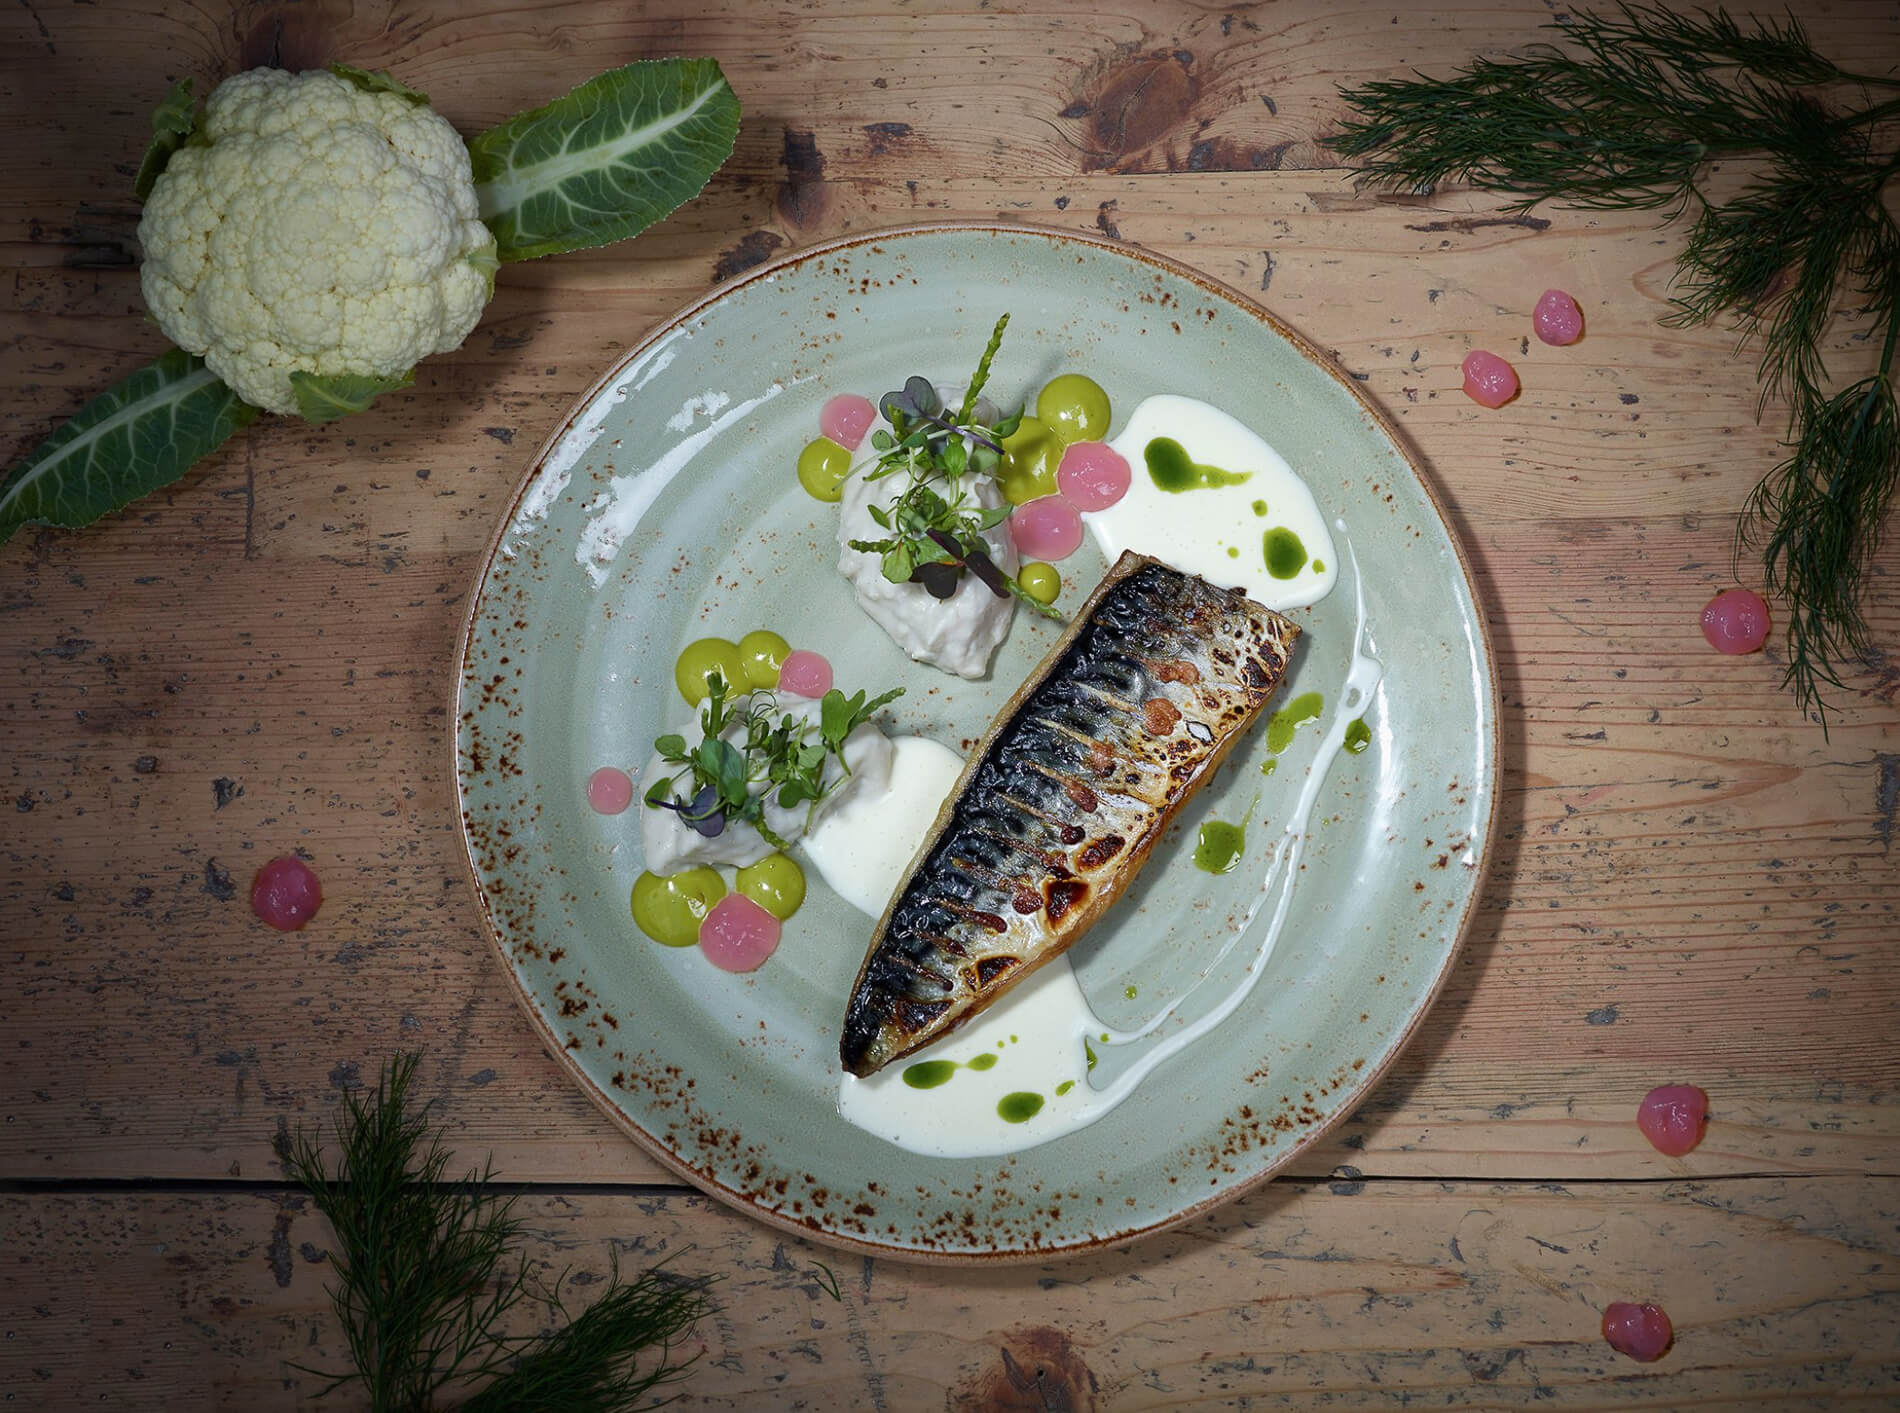 Peatus Tallinn gourmet dining